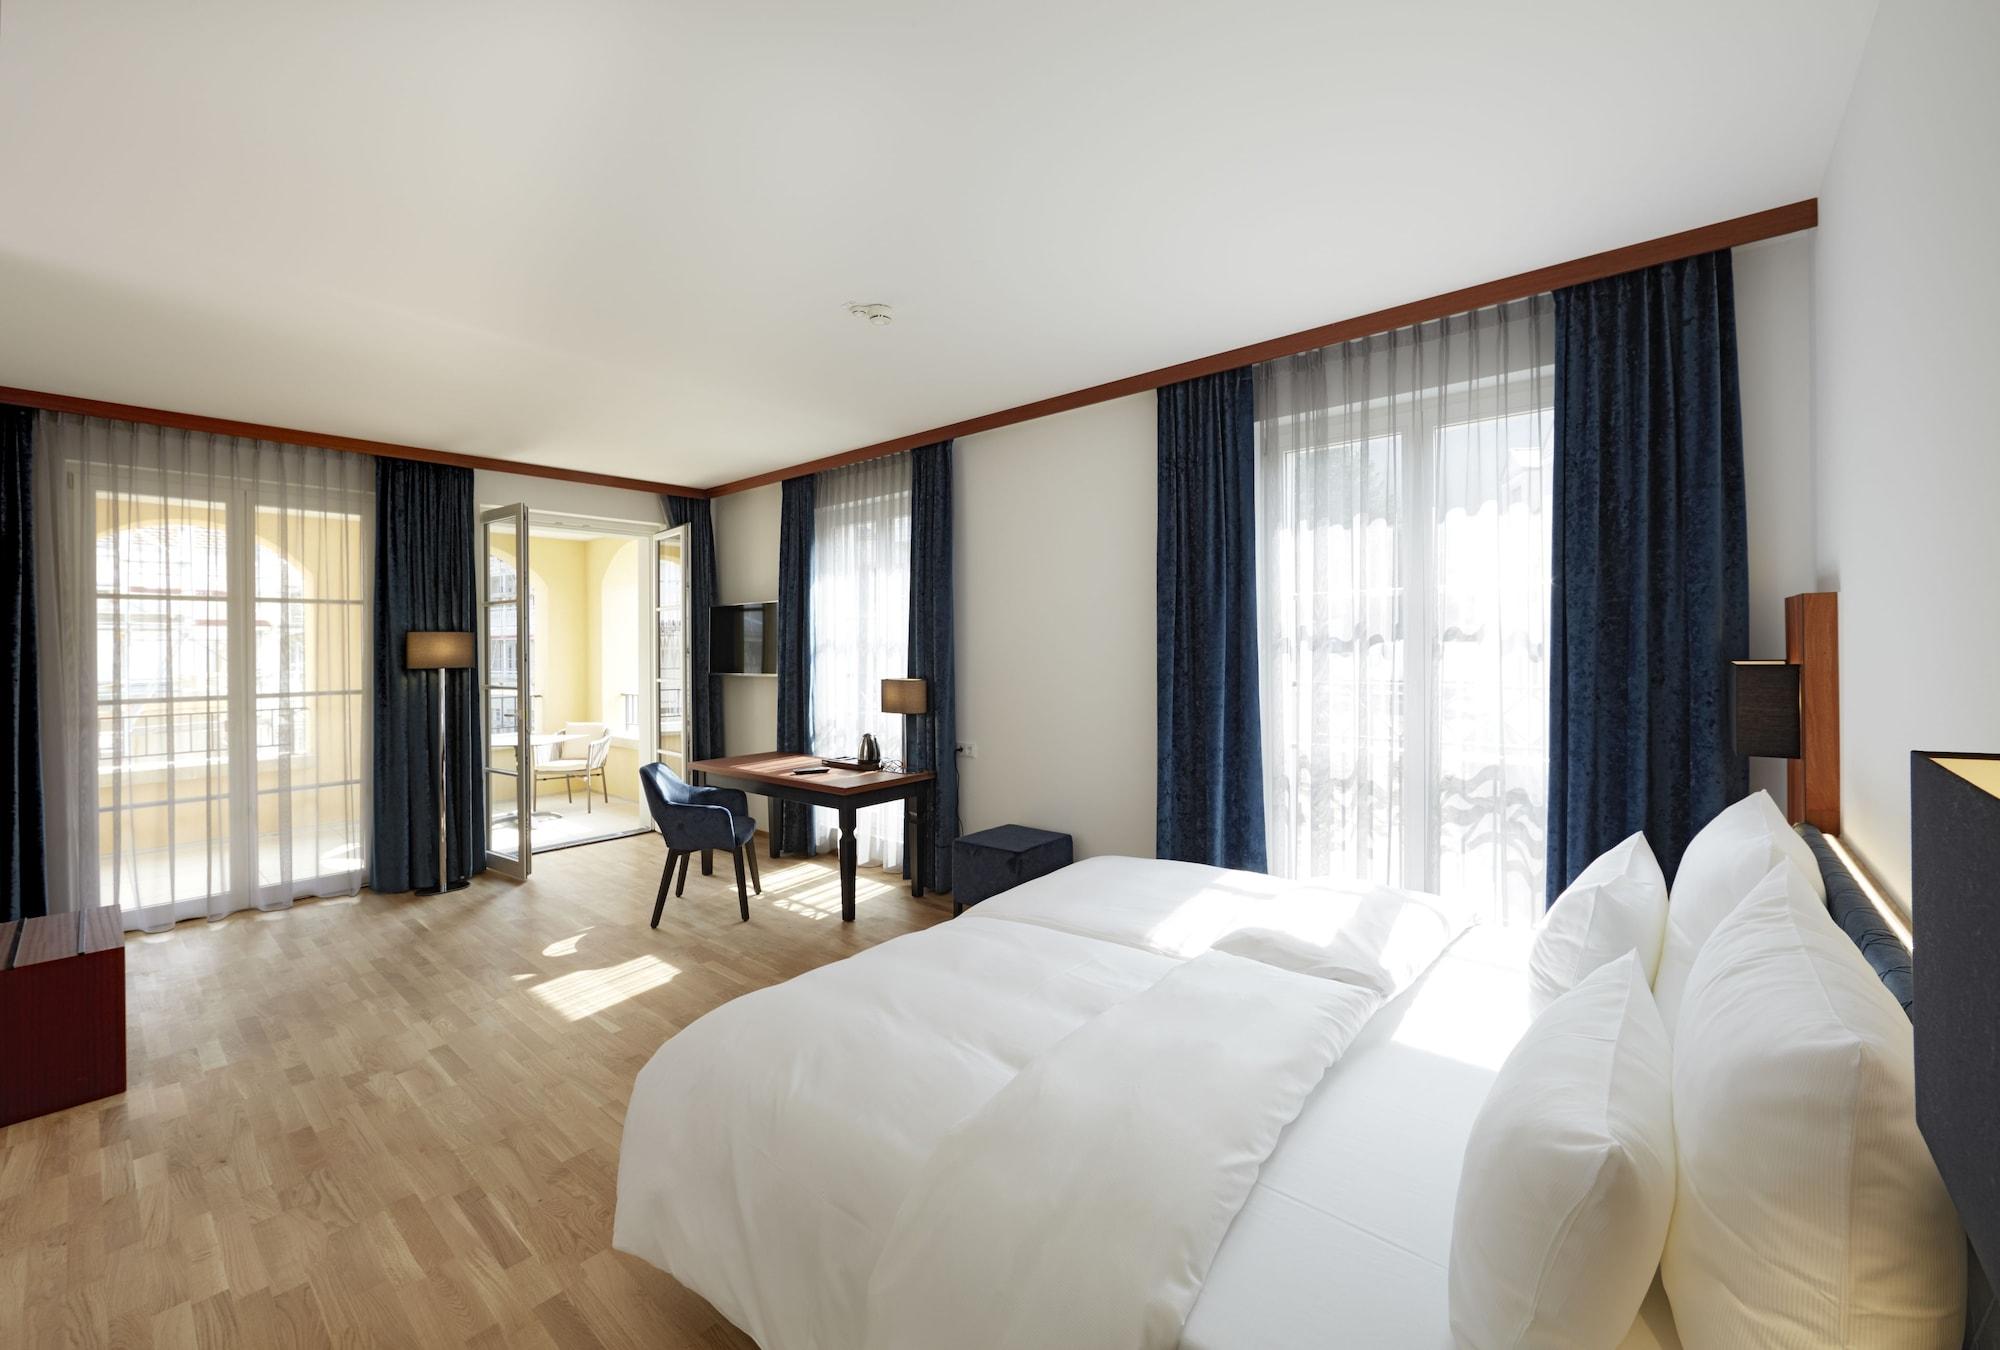 Seehotel Villa Linde, Konstanz